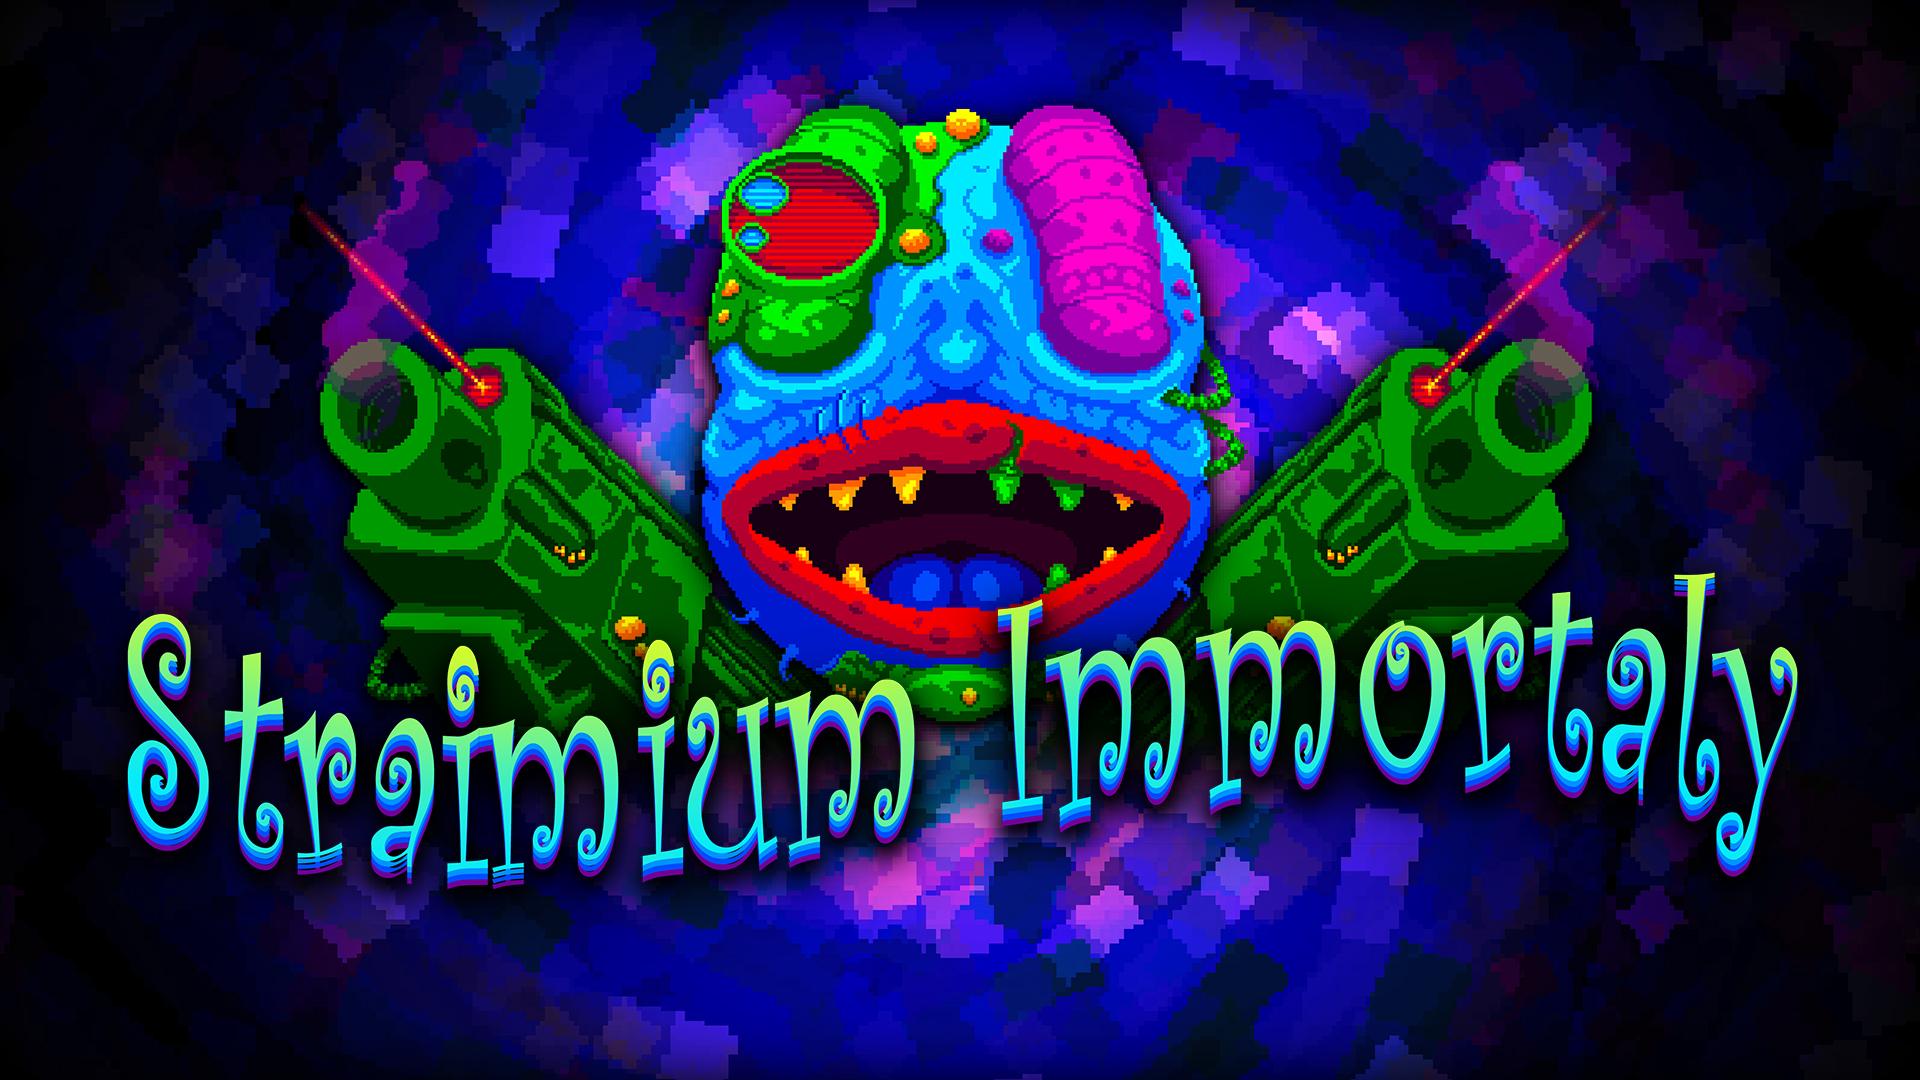 Pixel Art Shoot Em Up Straimium Immortaly Blasting Onto